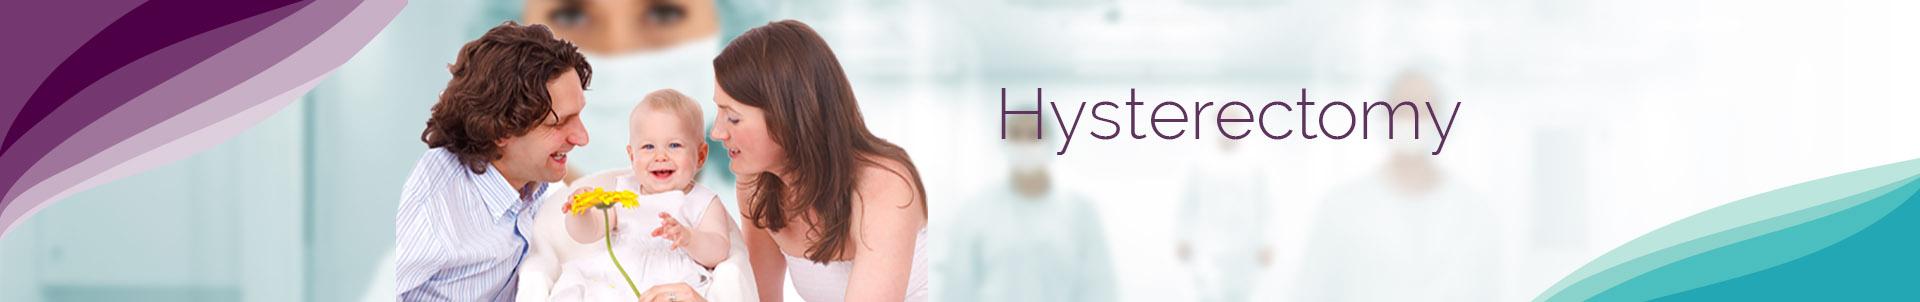 Hysterectomy Treatment at Apollo Cradle